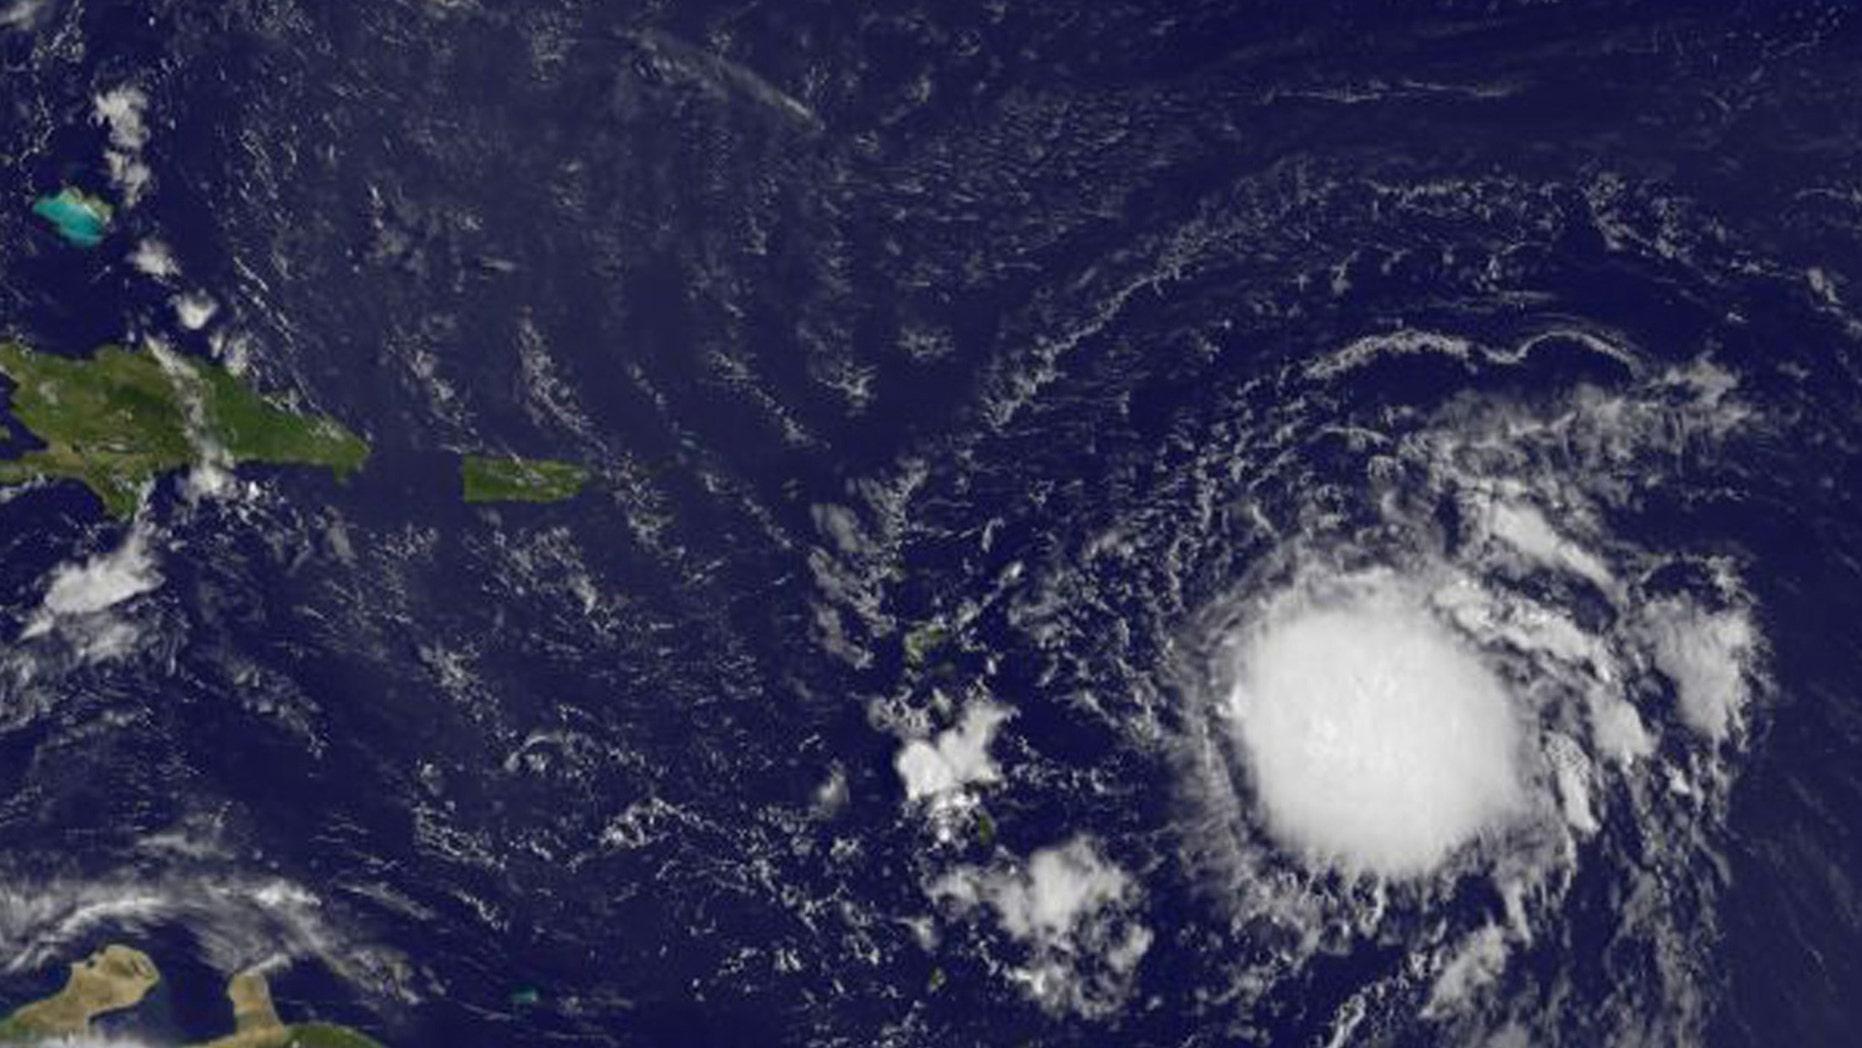 Tropical Storm Erika is pictured in the Atlantic Ocean northeast of Venezuela in this August 26, 2015 NASA handout satellite photo.